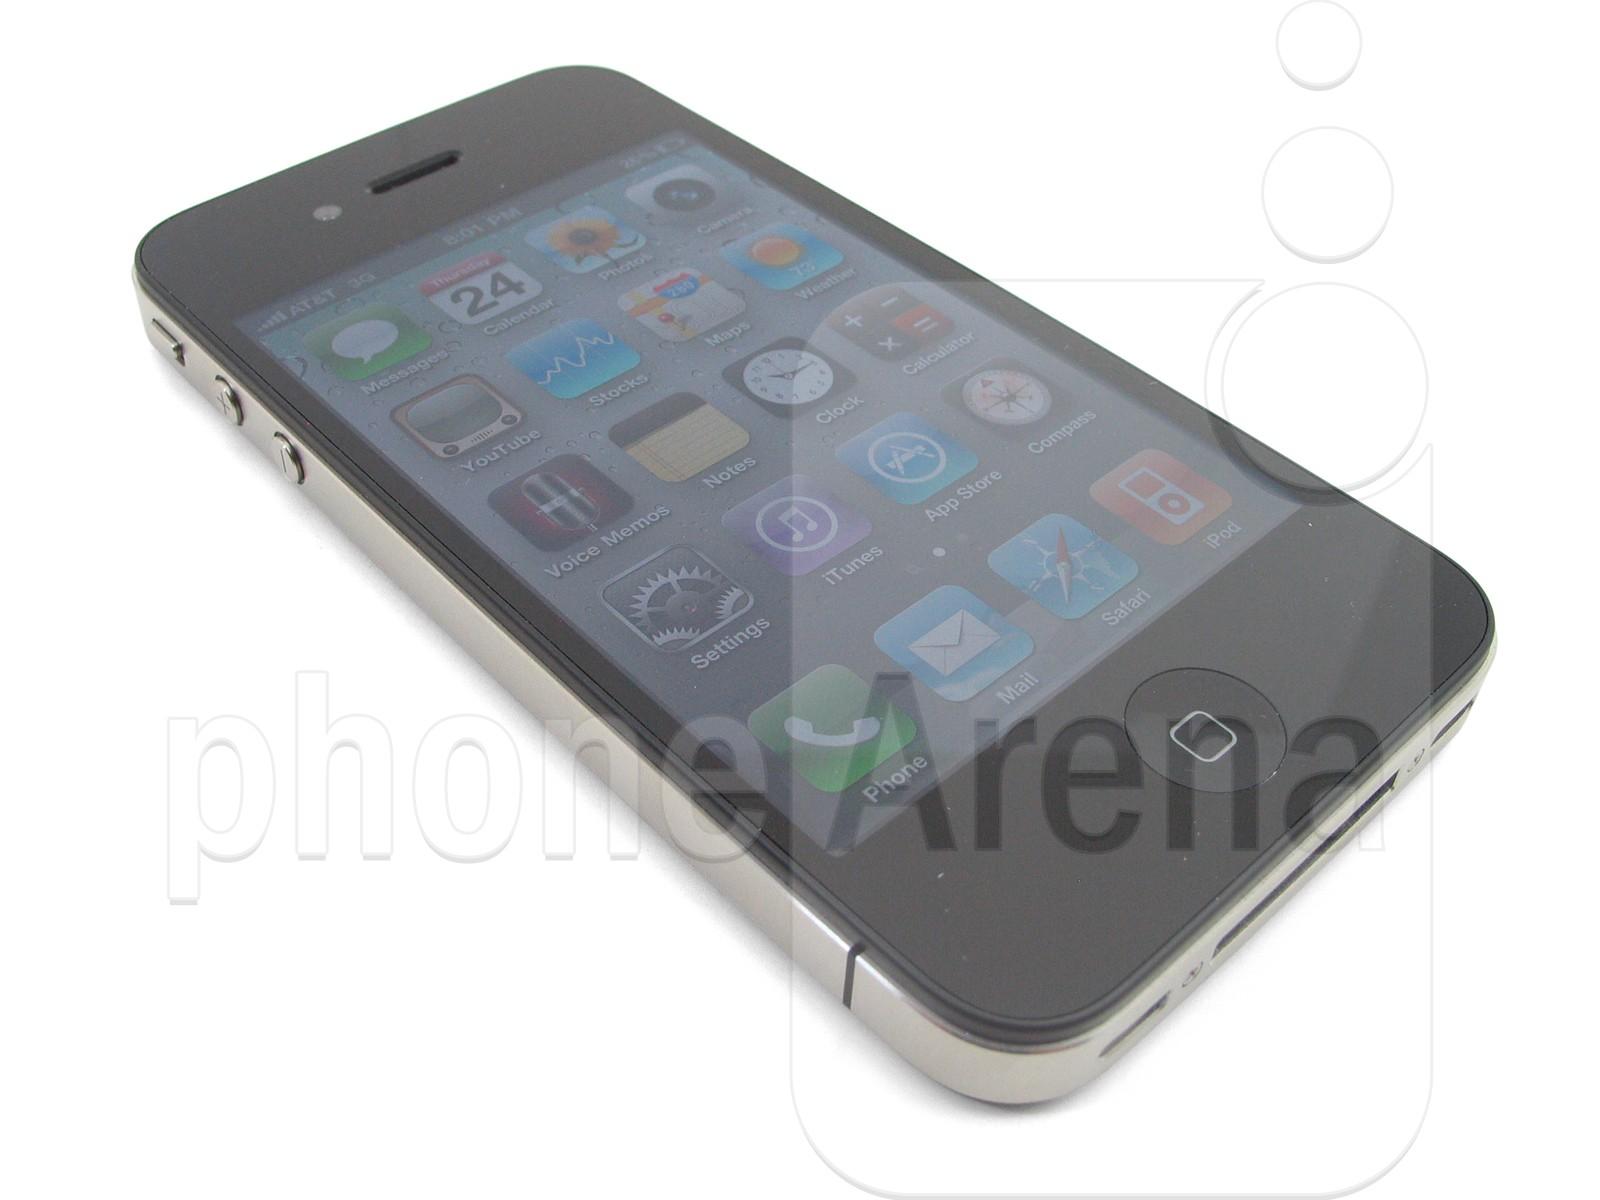 Apple iPhone 4 20